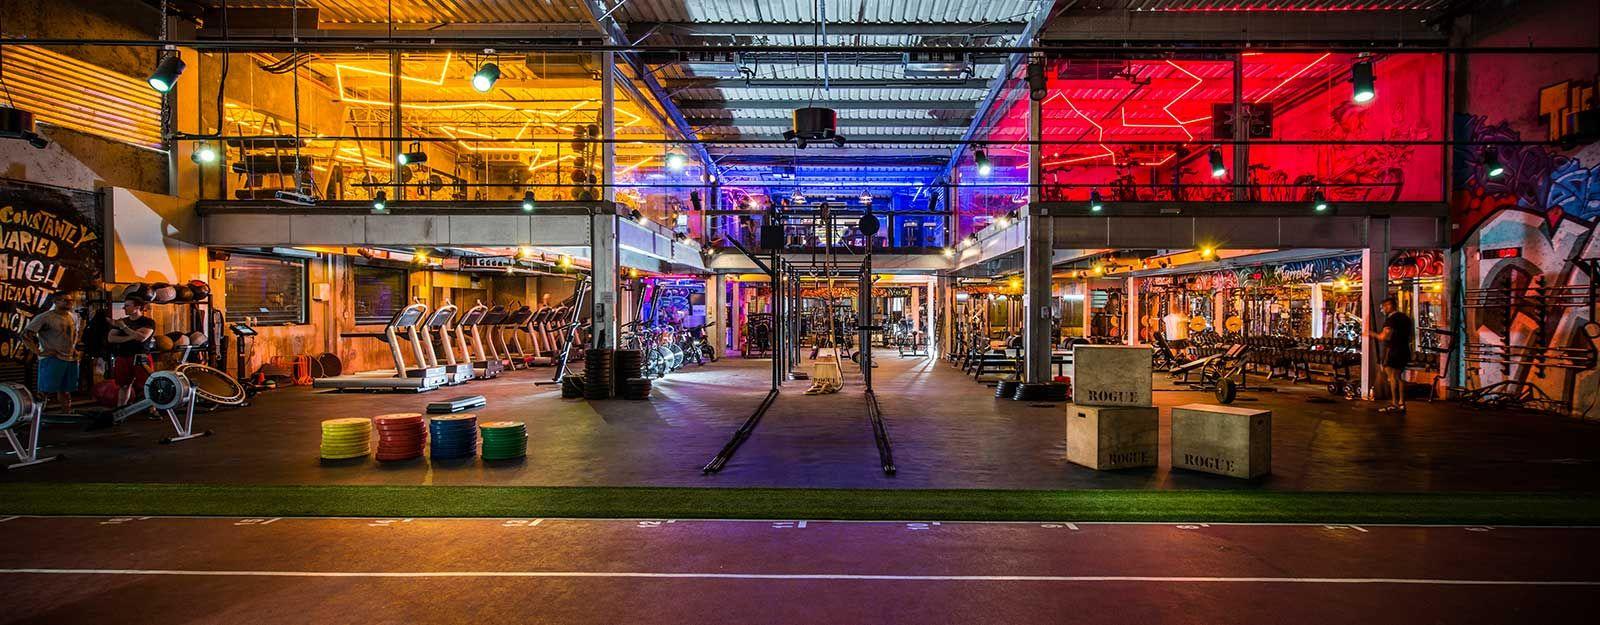 The Warehouse Fitness Center LLC Dubai, UAE Gym